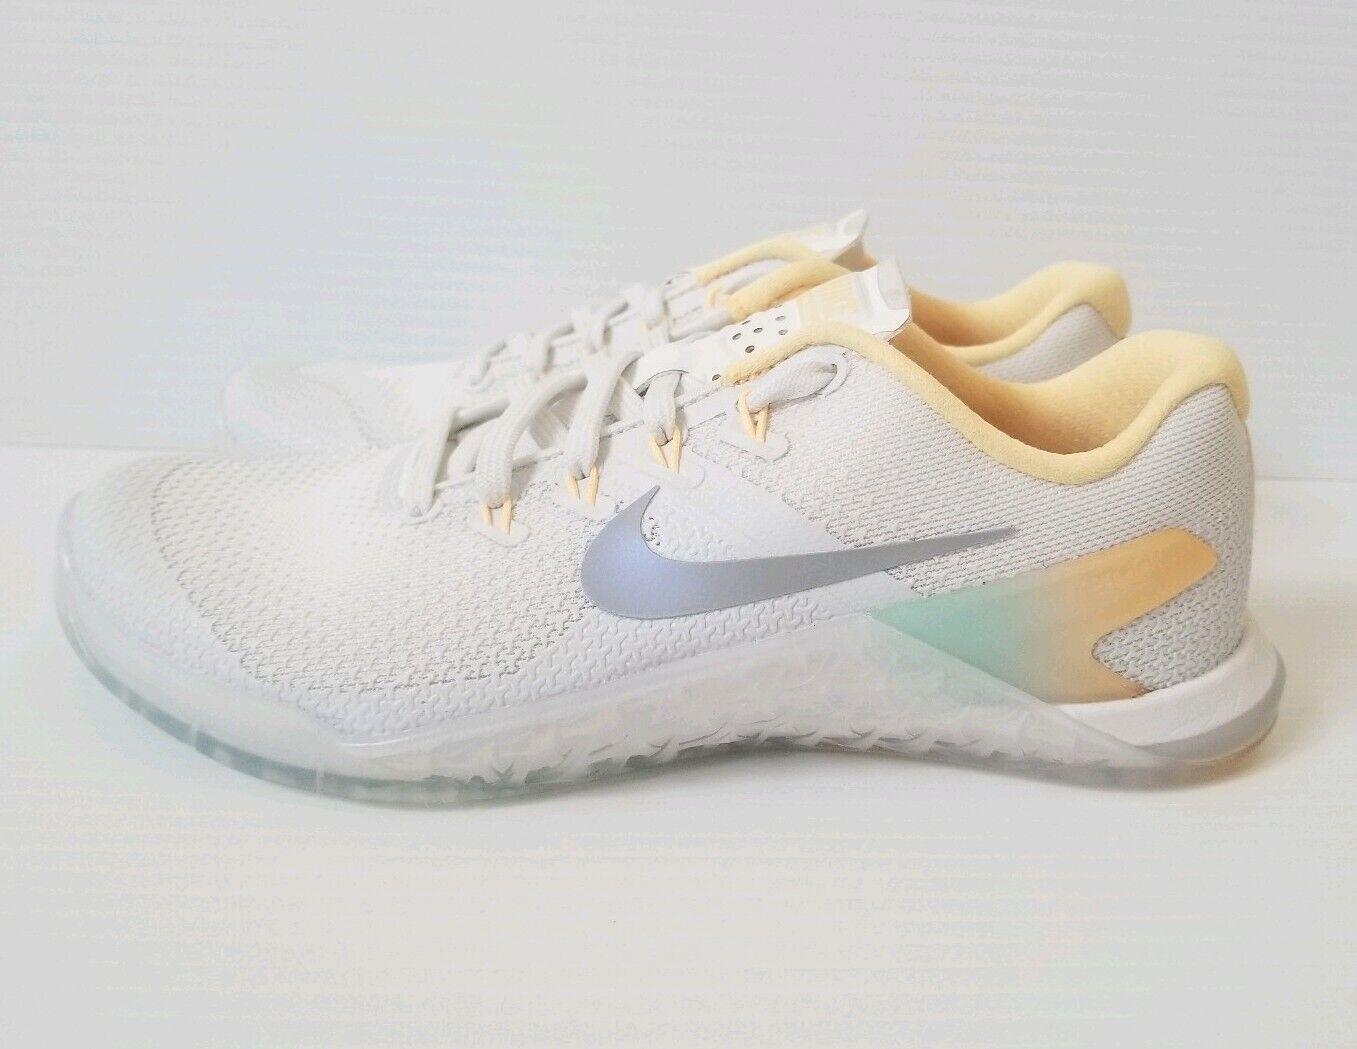 Nike Metcon 4 Rise White Wolf Grey Women's Training shoes Sz 7 (AH8184 100)